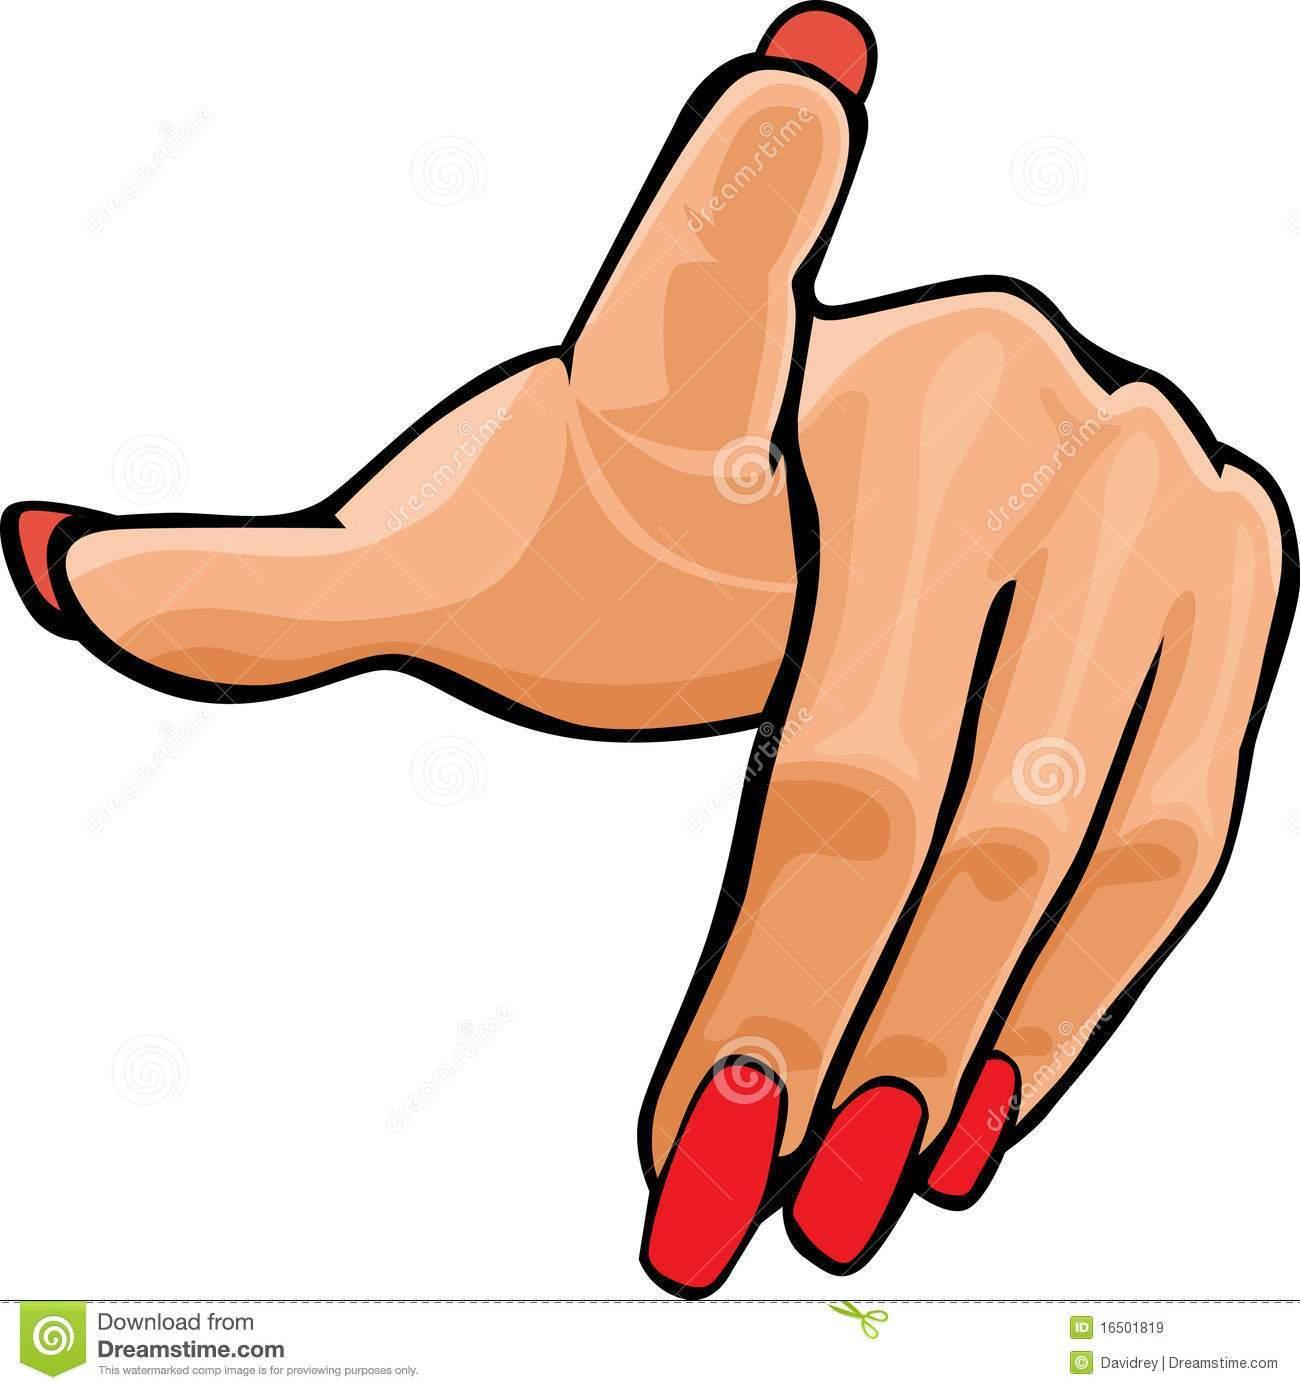 Finger nails clipart clipart freeuse Clipart Hand Pointing Woman Cartoon Fingernails - ArtToNail clipart freeuse